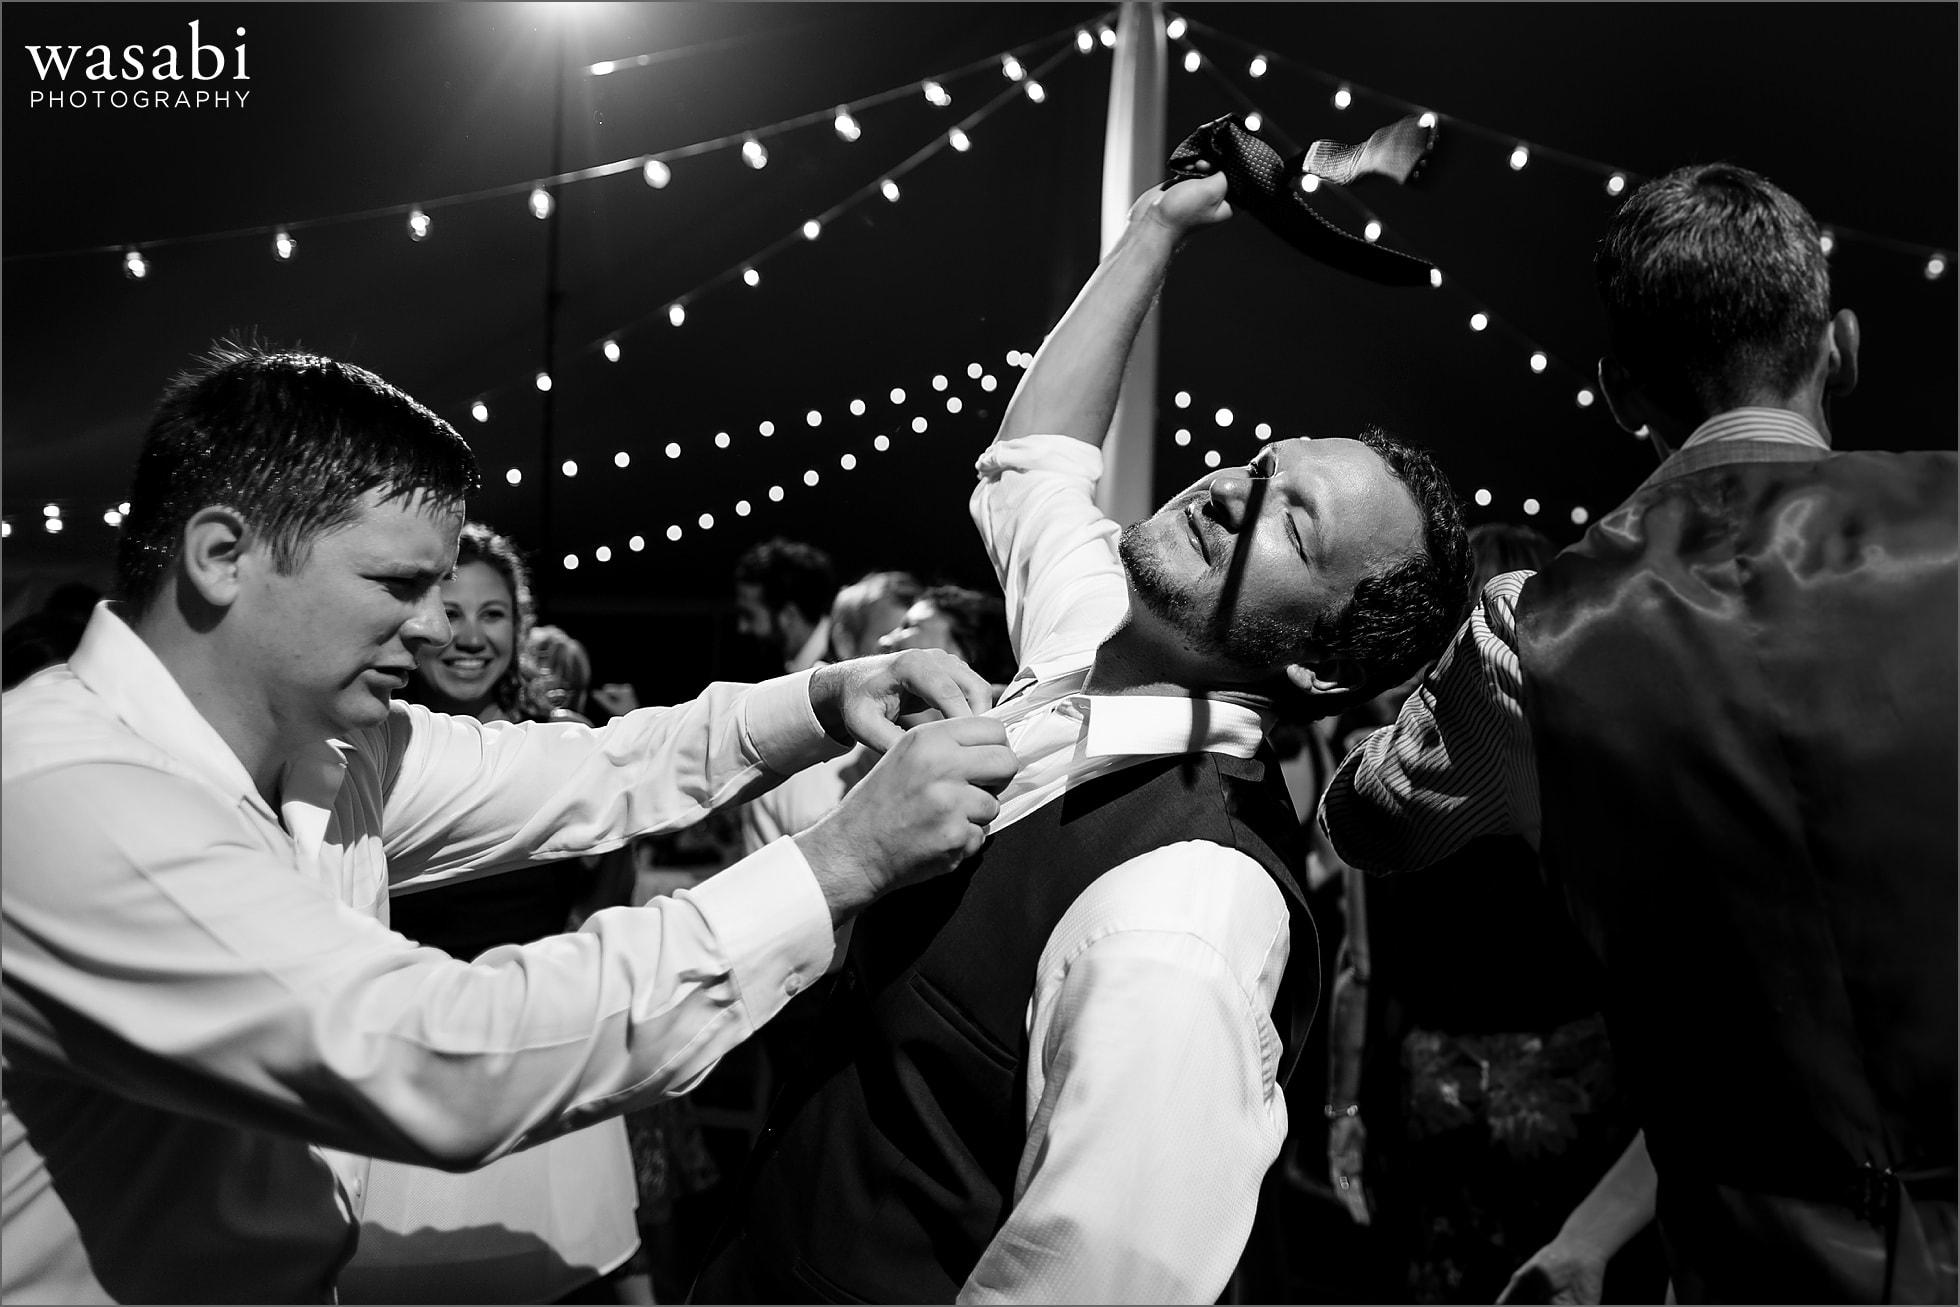 crazy wedding reception dancing photos